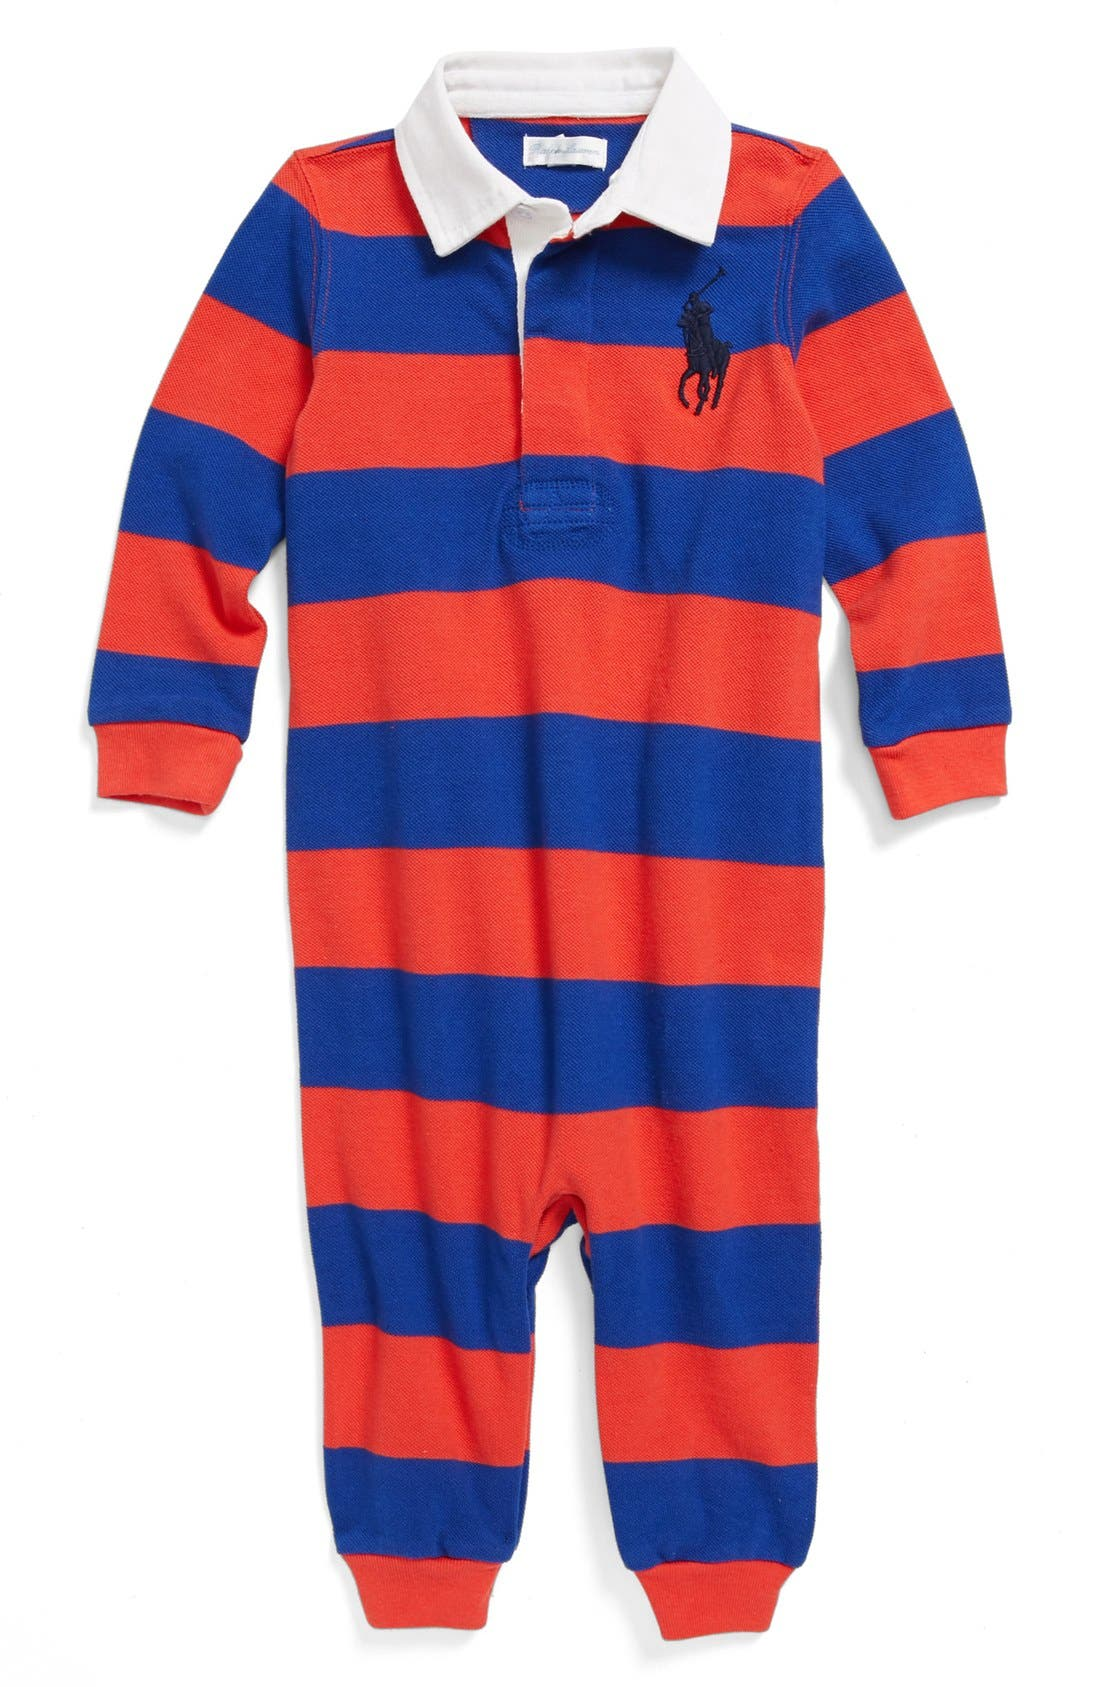 Main Image - Ralph Lauren Stripe Cotton Romper (Baby Boys)